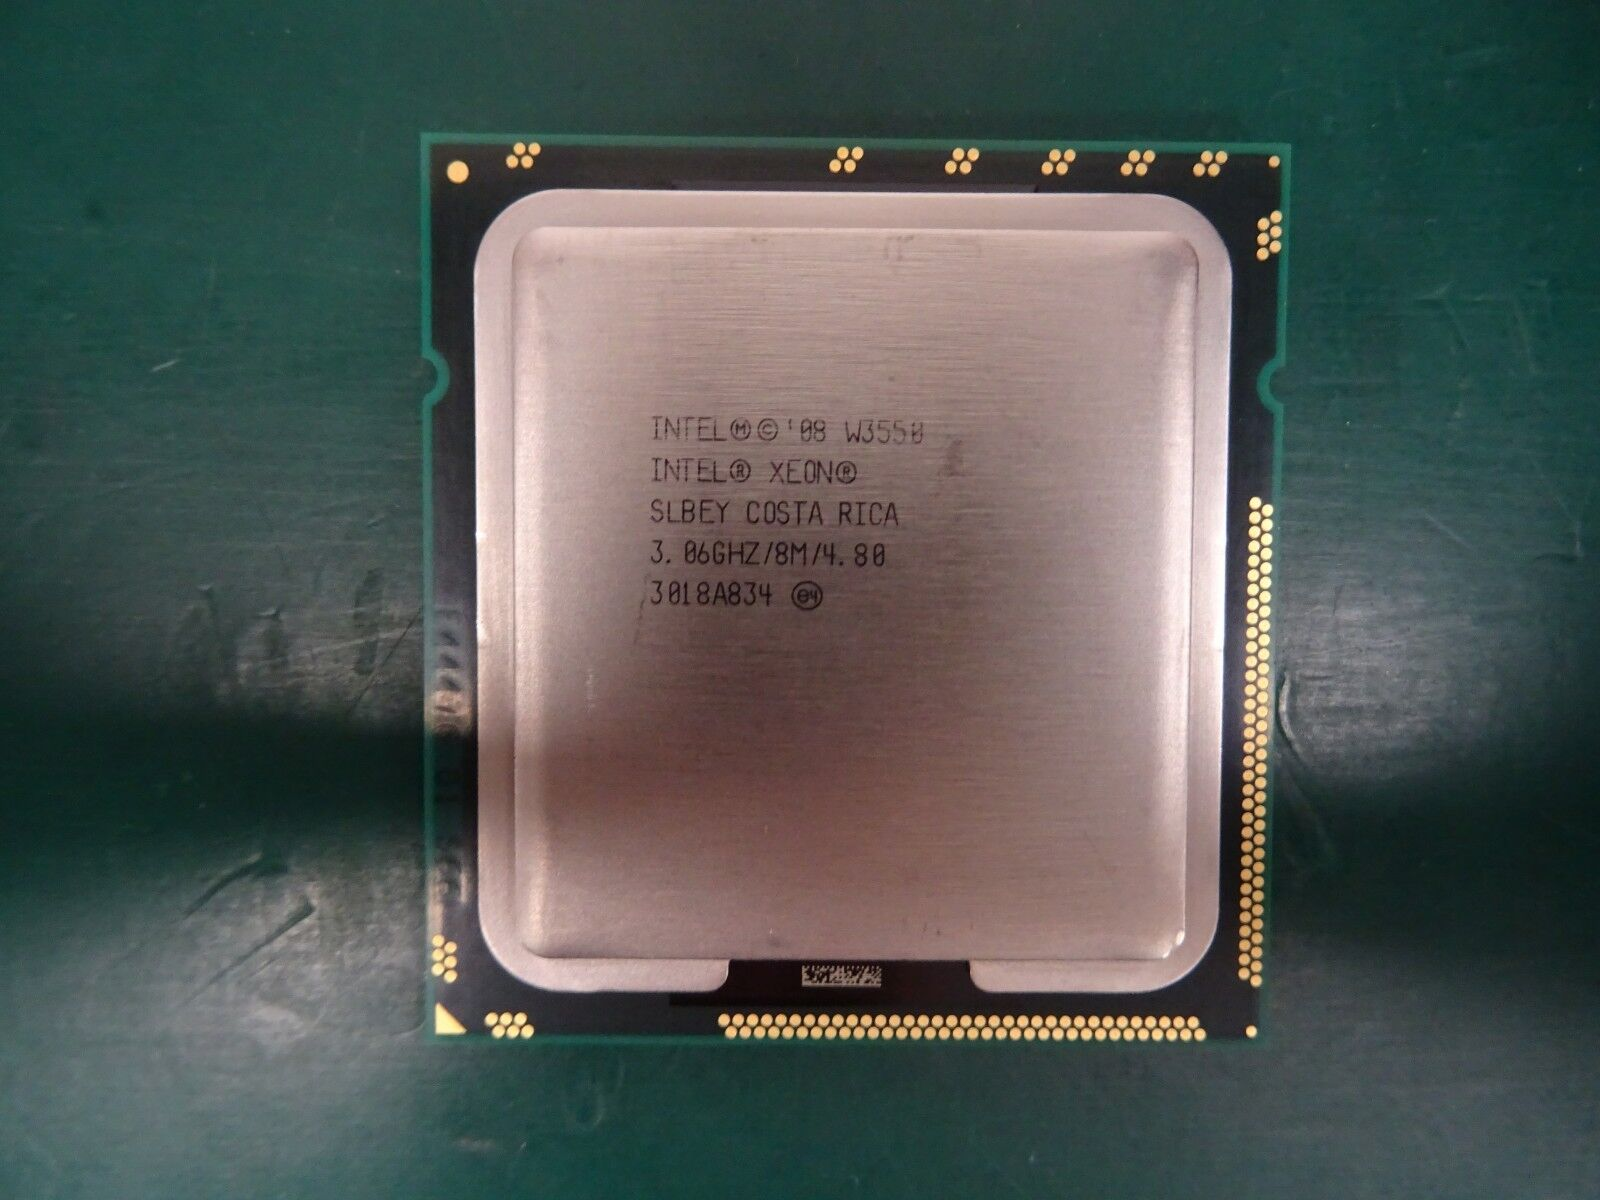 10 x Intel Xeon Processor CPU SLBEY W3550 8 MB L3 Cache 3.06 GHz 4.8 GT/s 130w